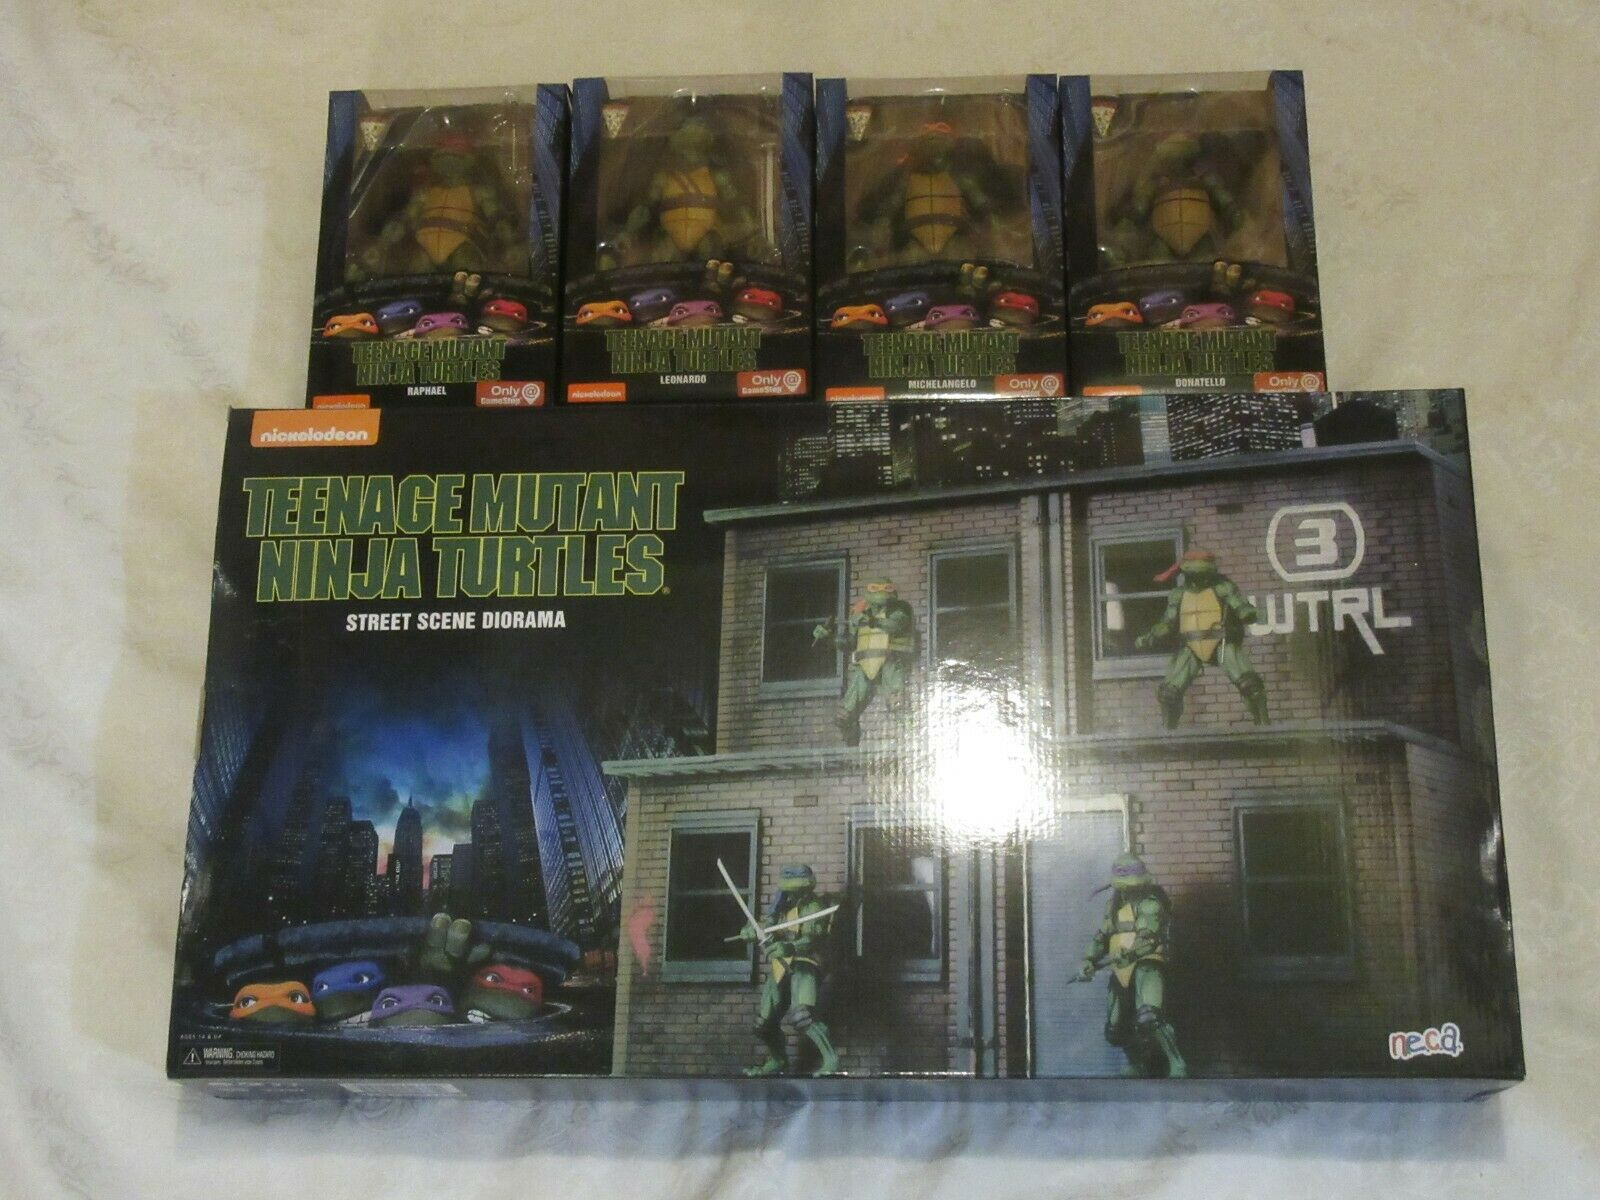 Teenage Mutant Ninja Turtles TEENAGE MUTANT NINJA TURTLES San Diego comic-con 2018 Street Diorama & GameStop Conjunto de 4